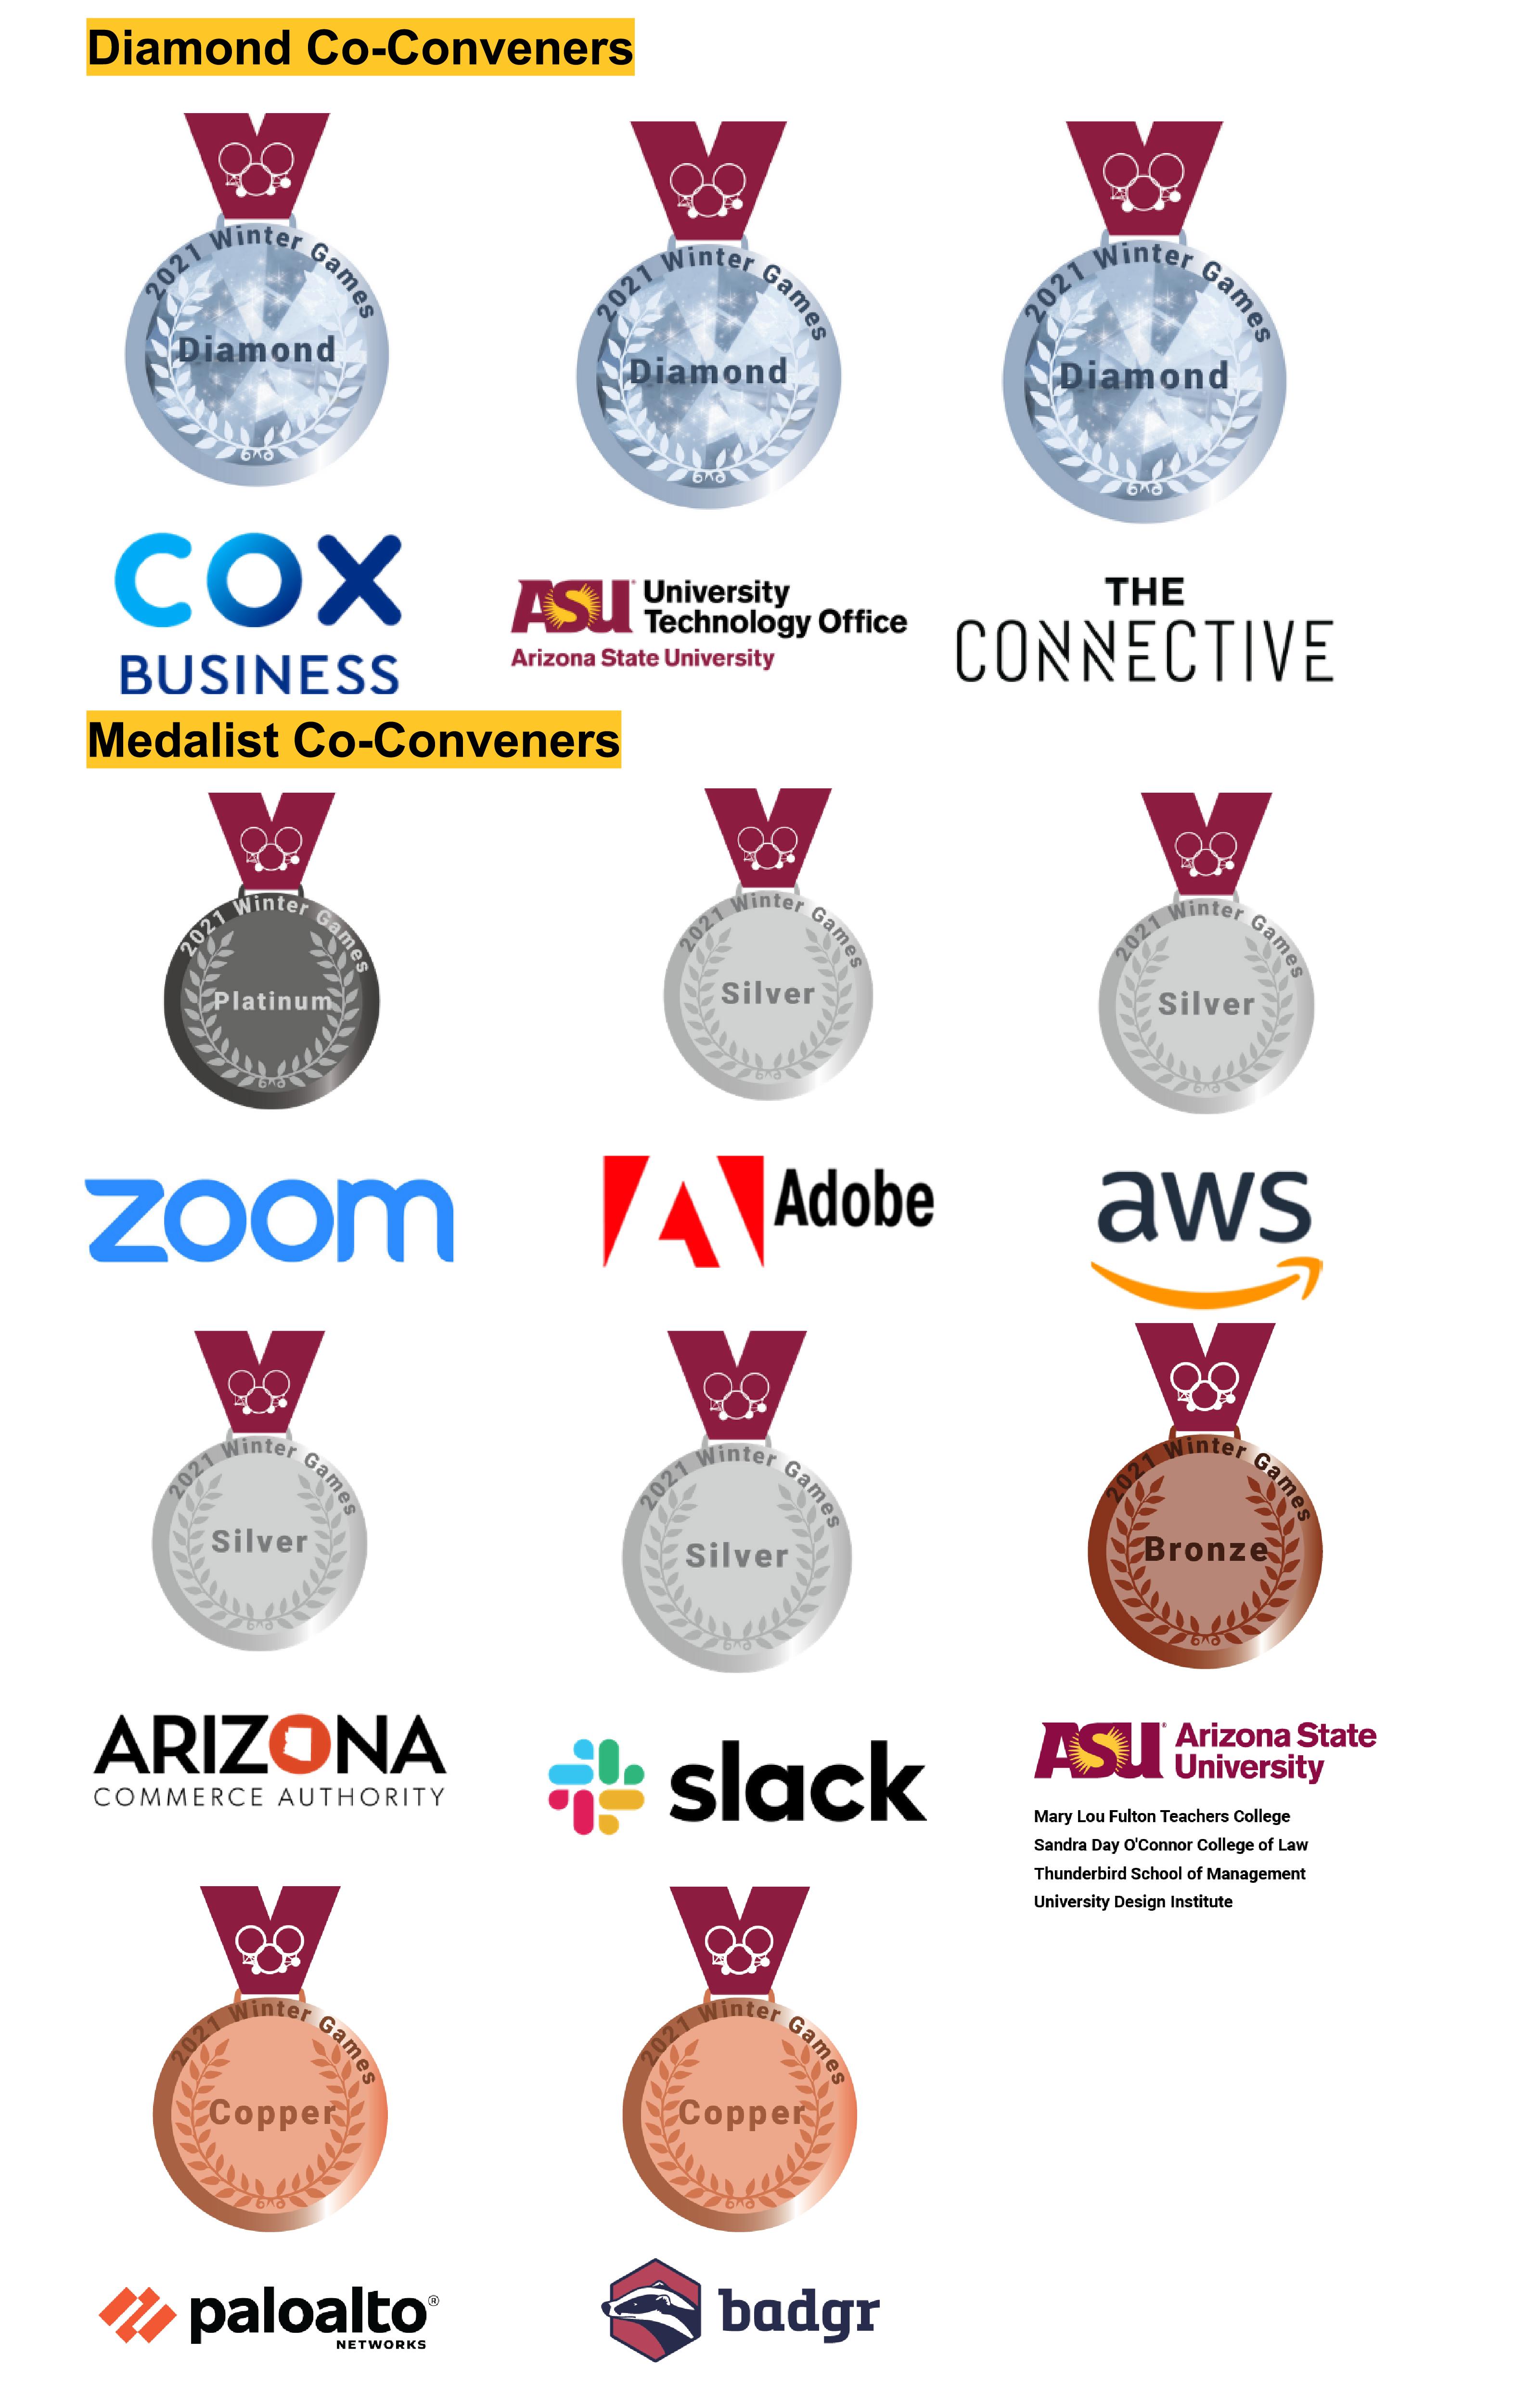 Winter Games Co-Conveners